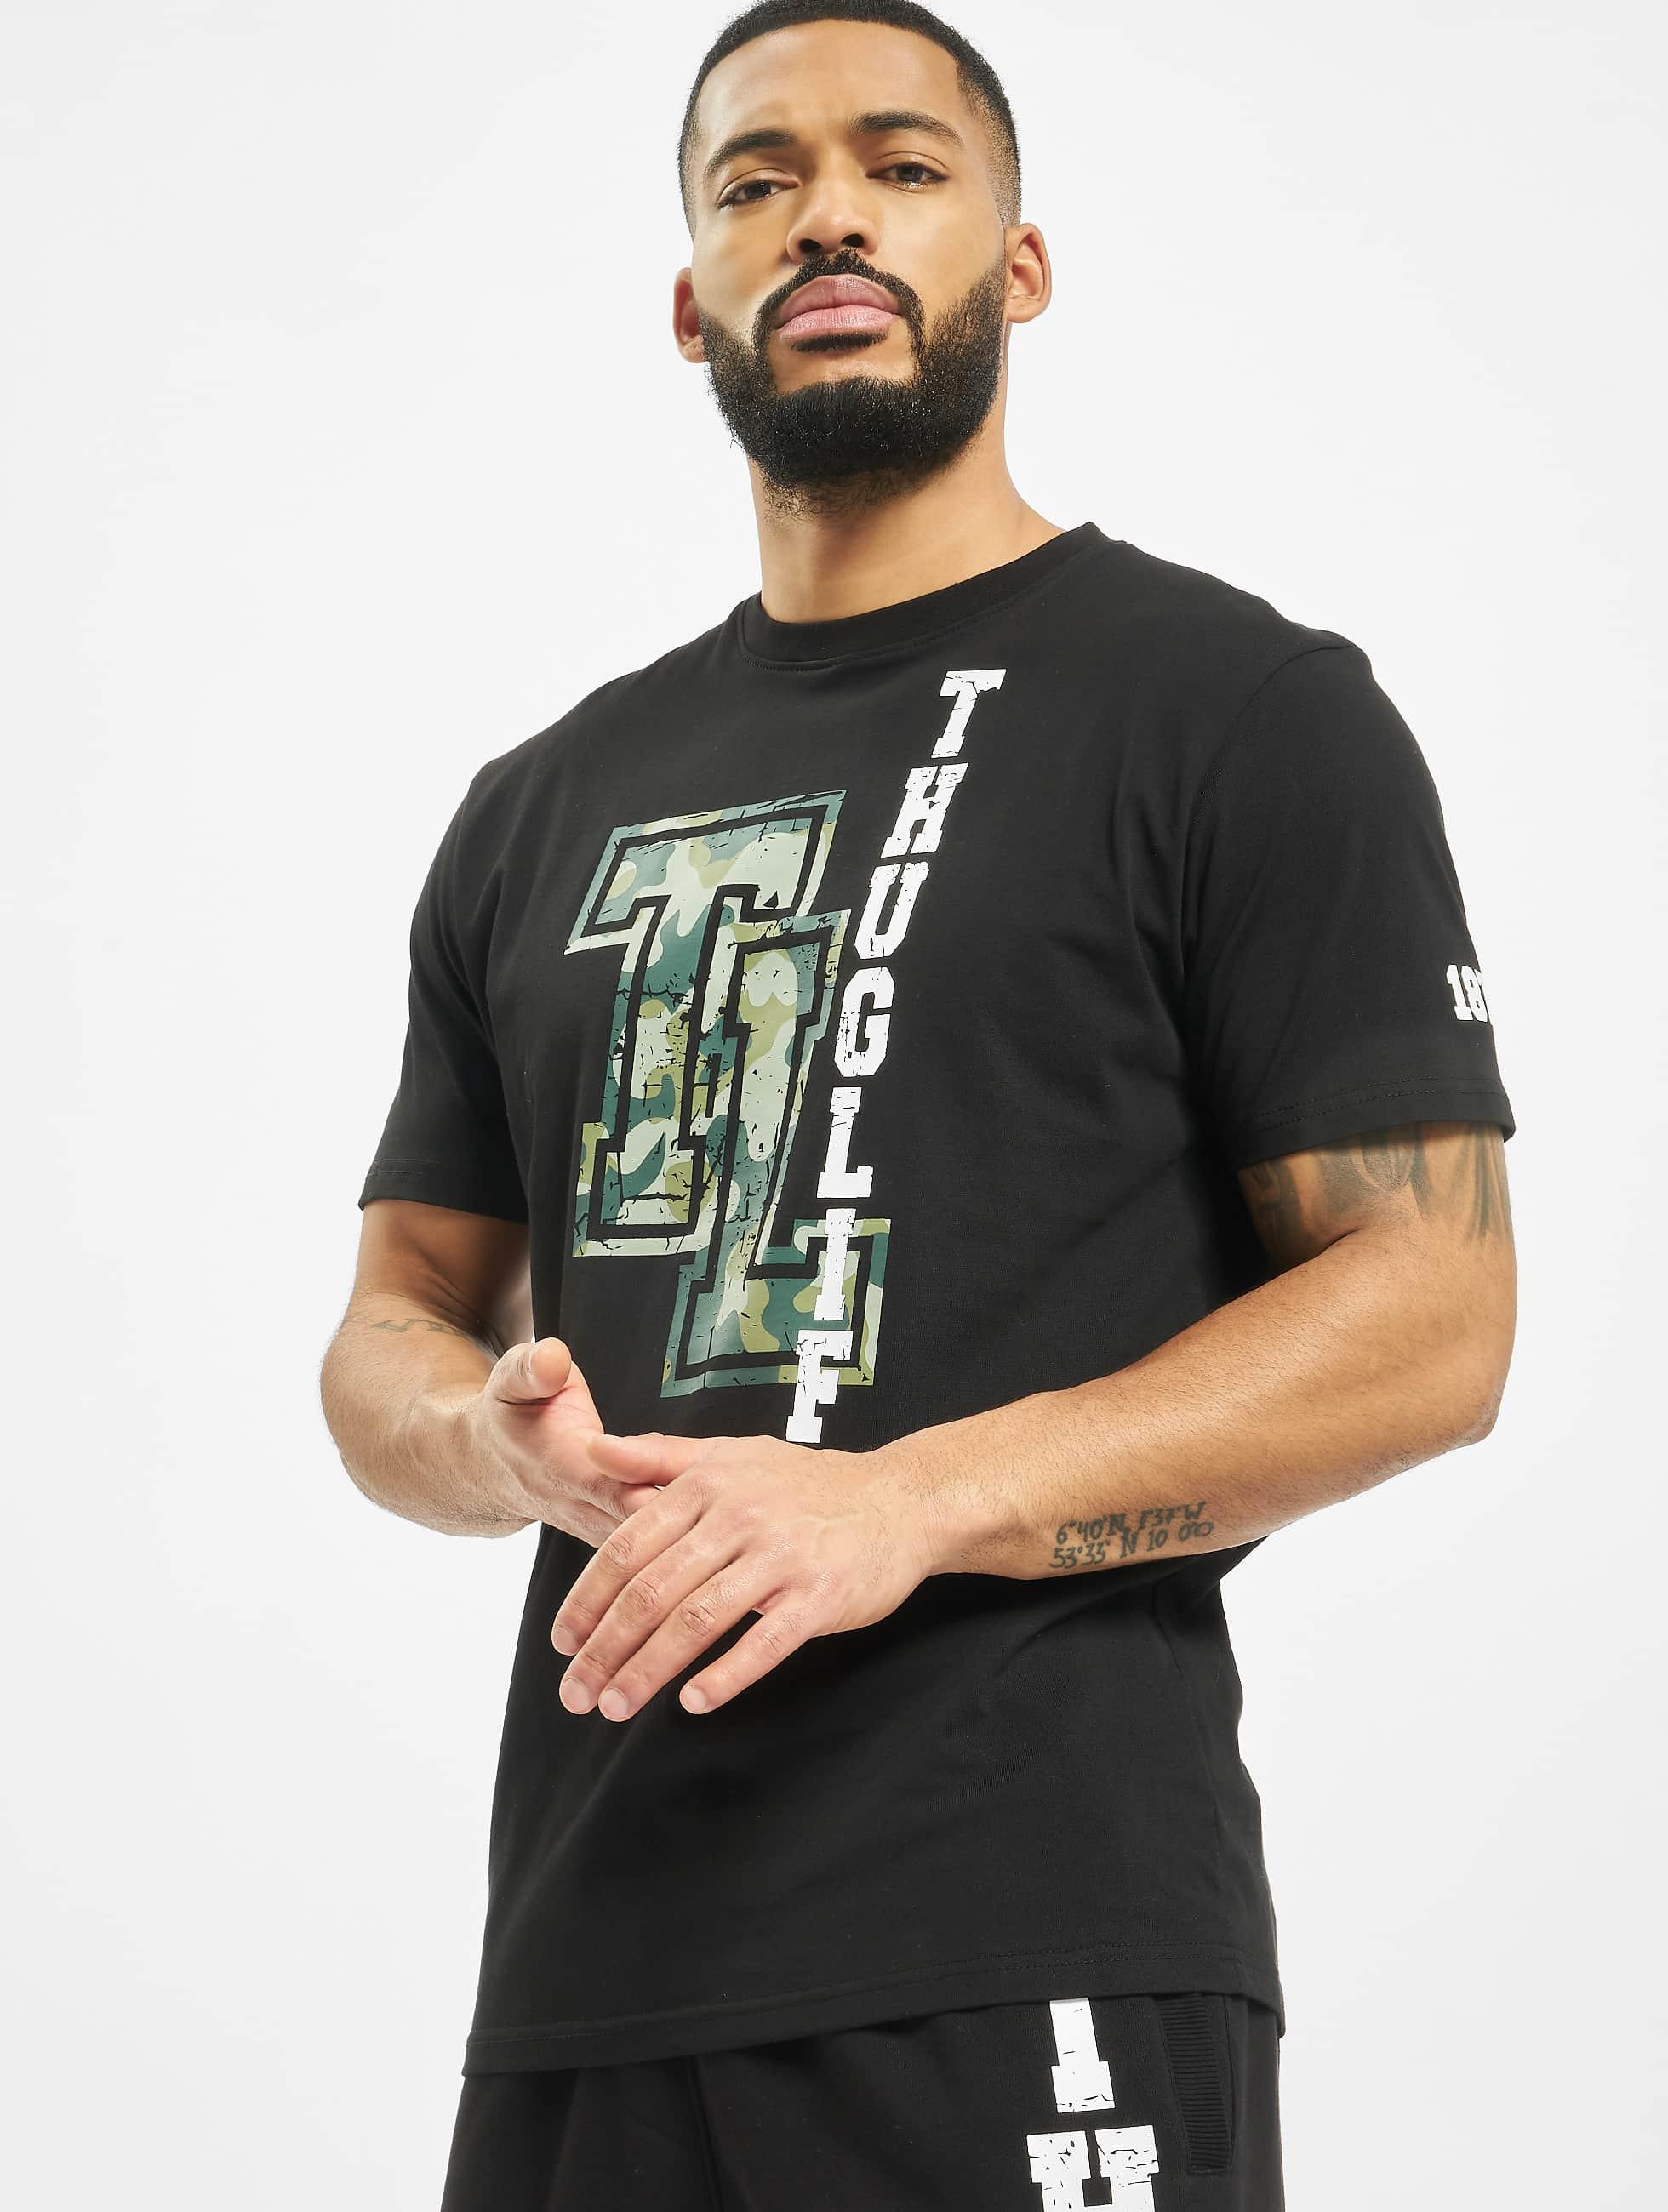 Thug Life / T-Shirt Under Pressure in black S